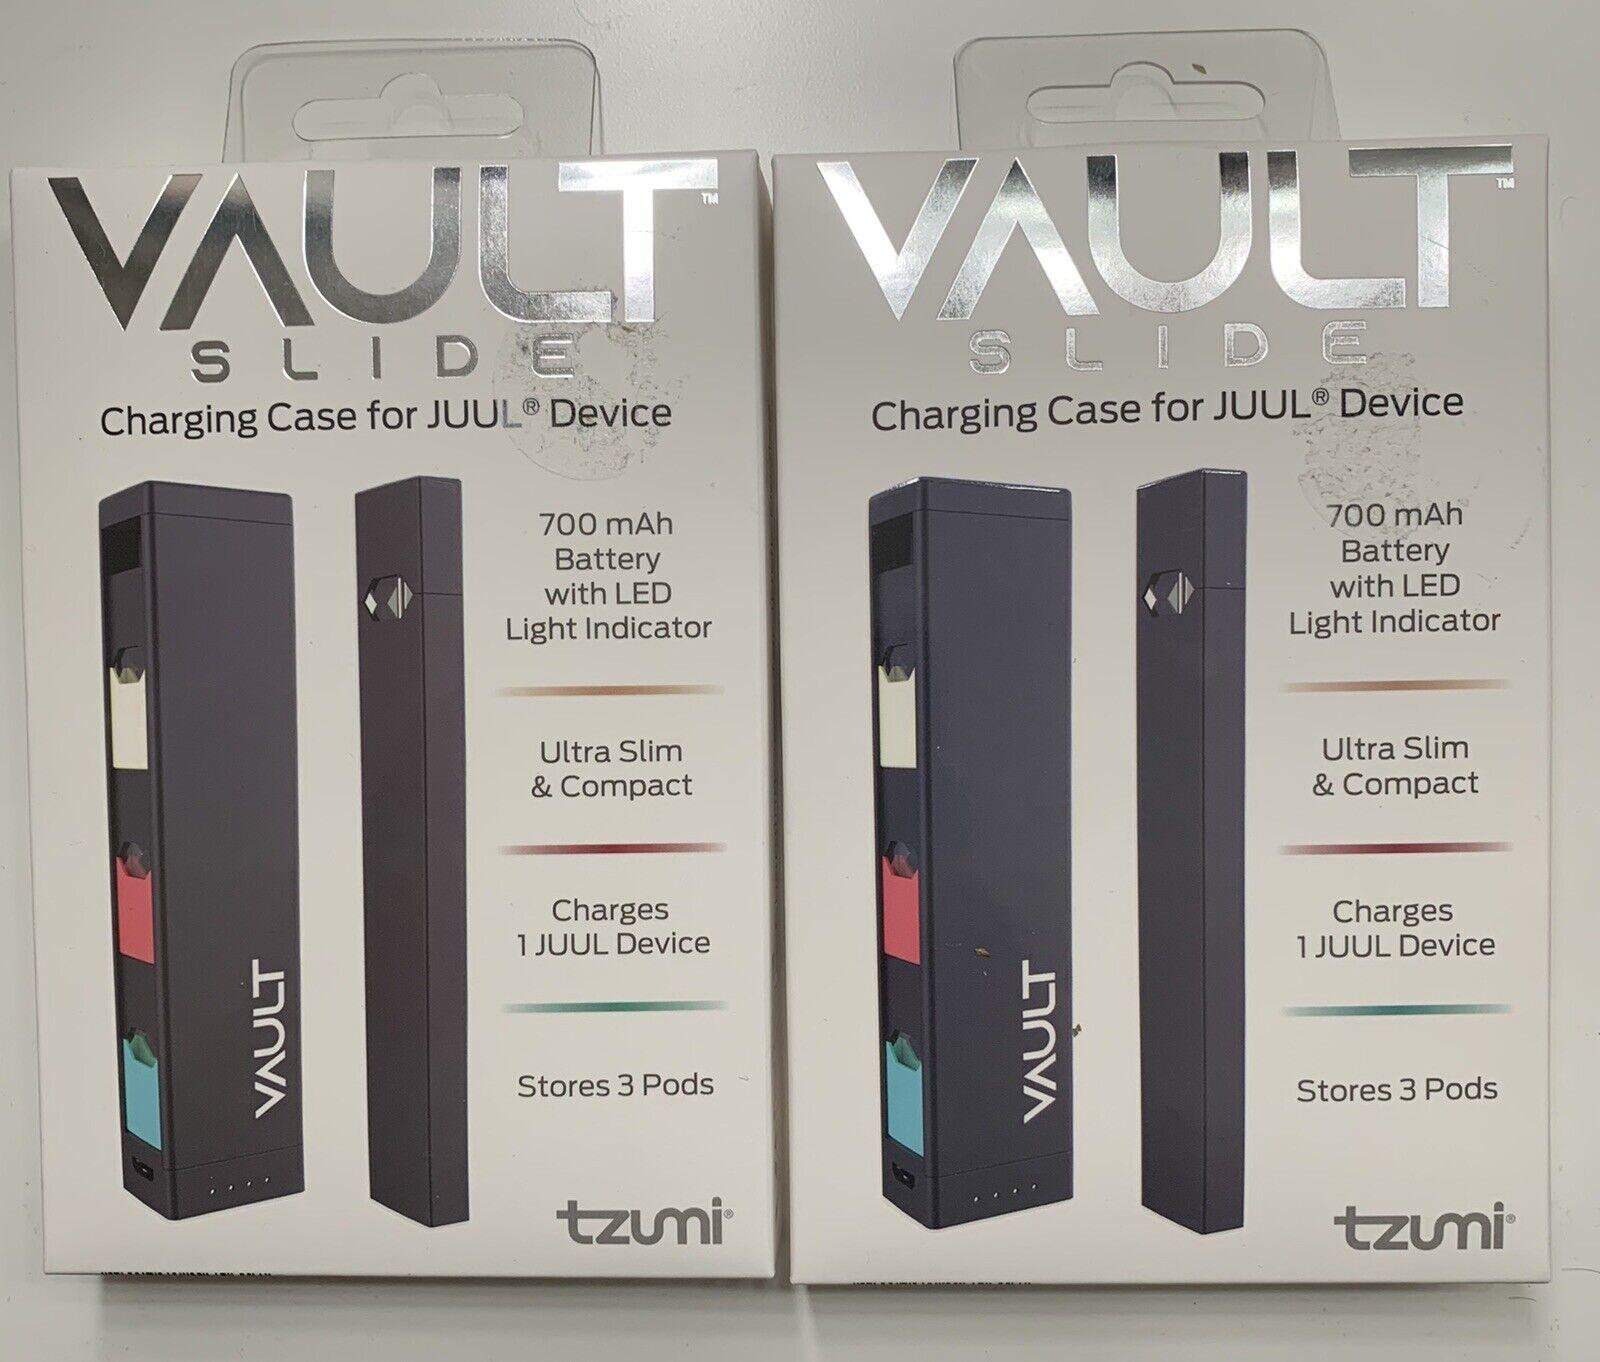 New (2pack)Tzumi vault slide charging case - Free Shipping